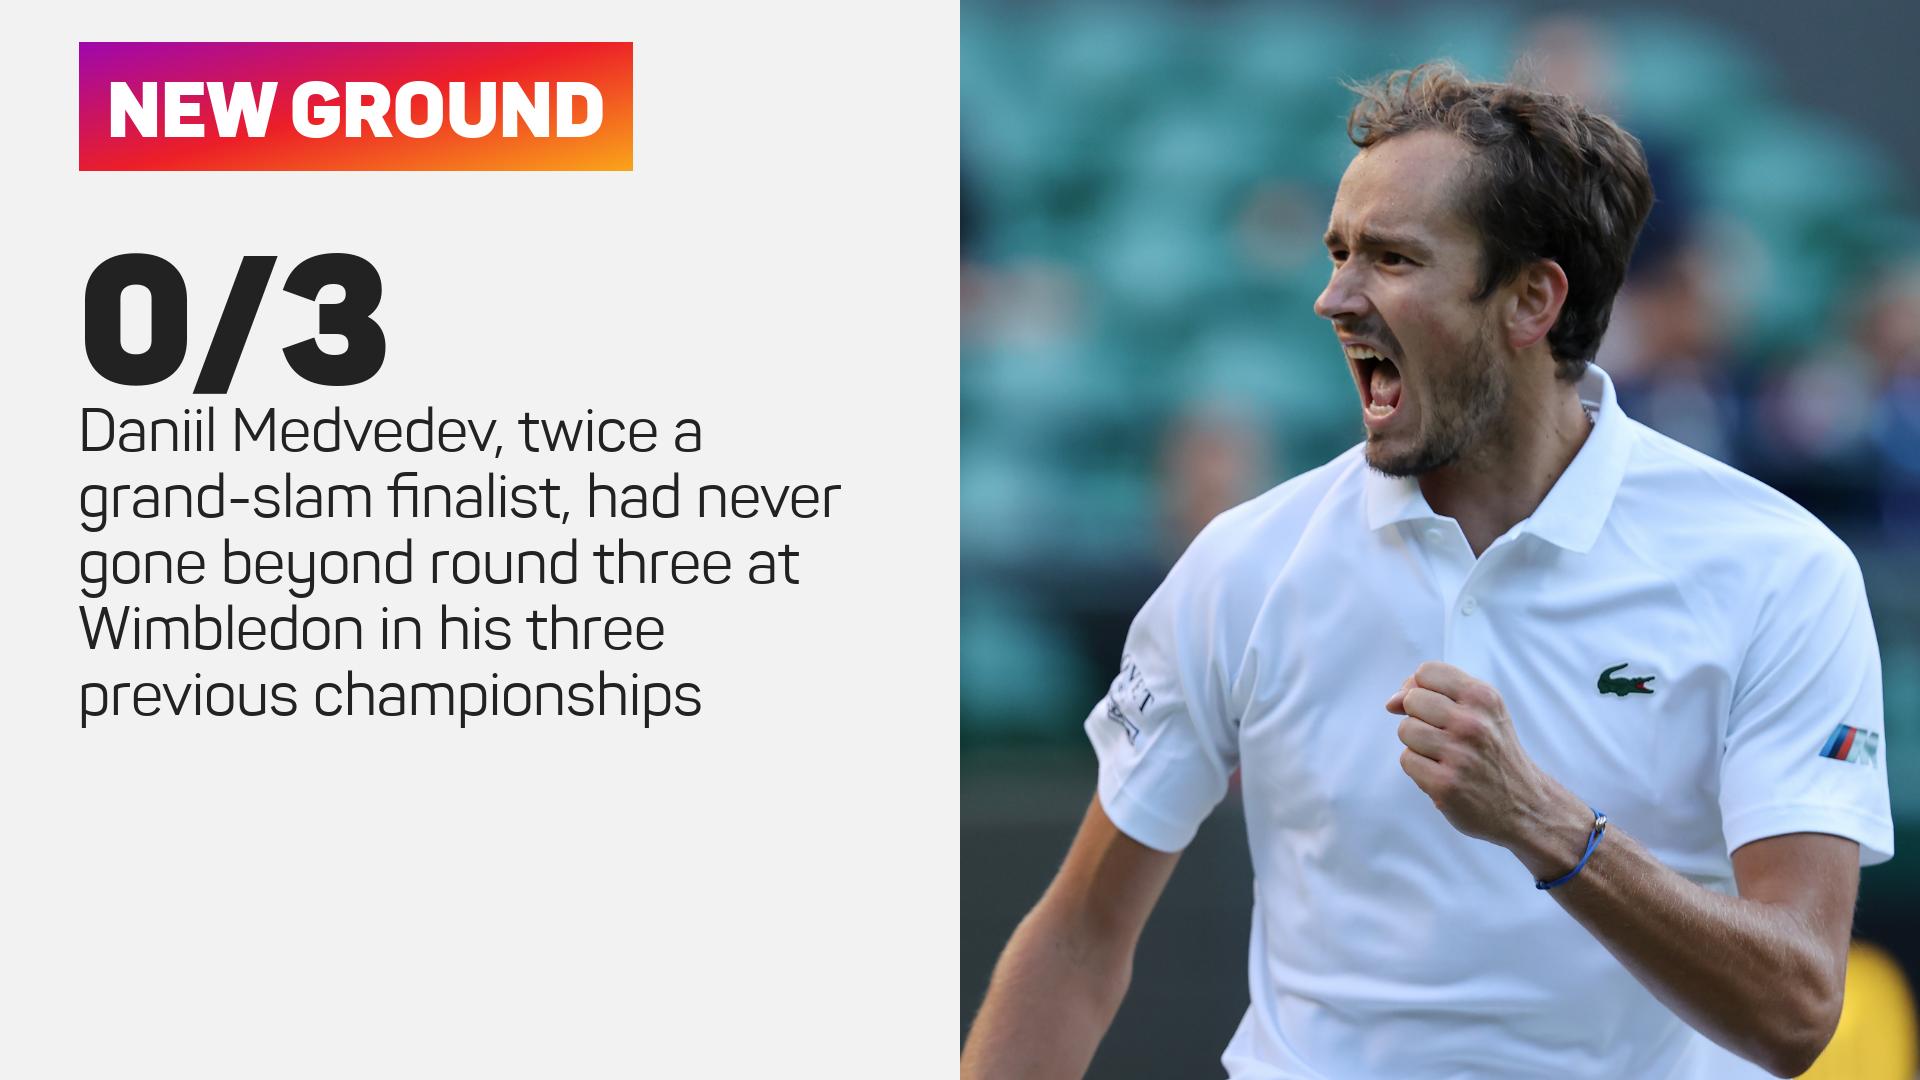 Daniil Medvedev at Wimbledon